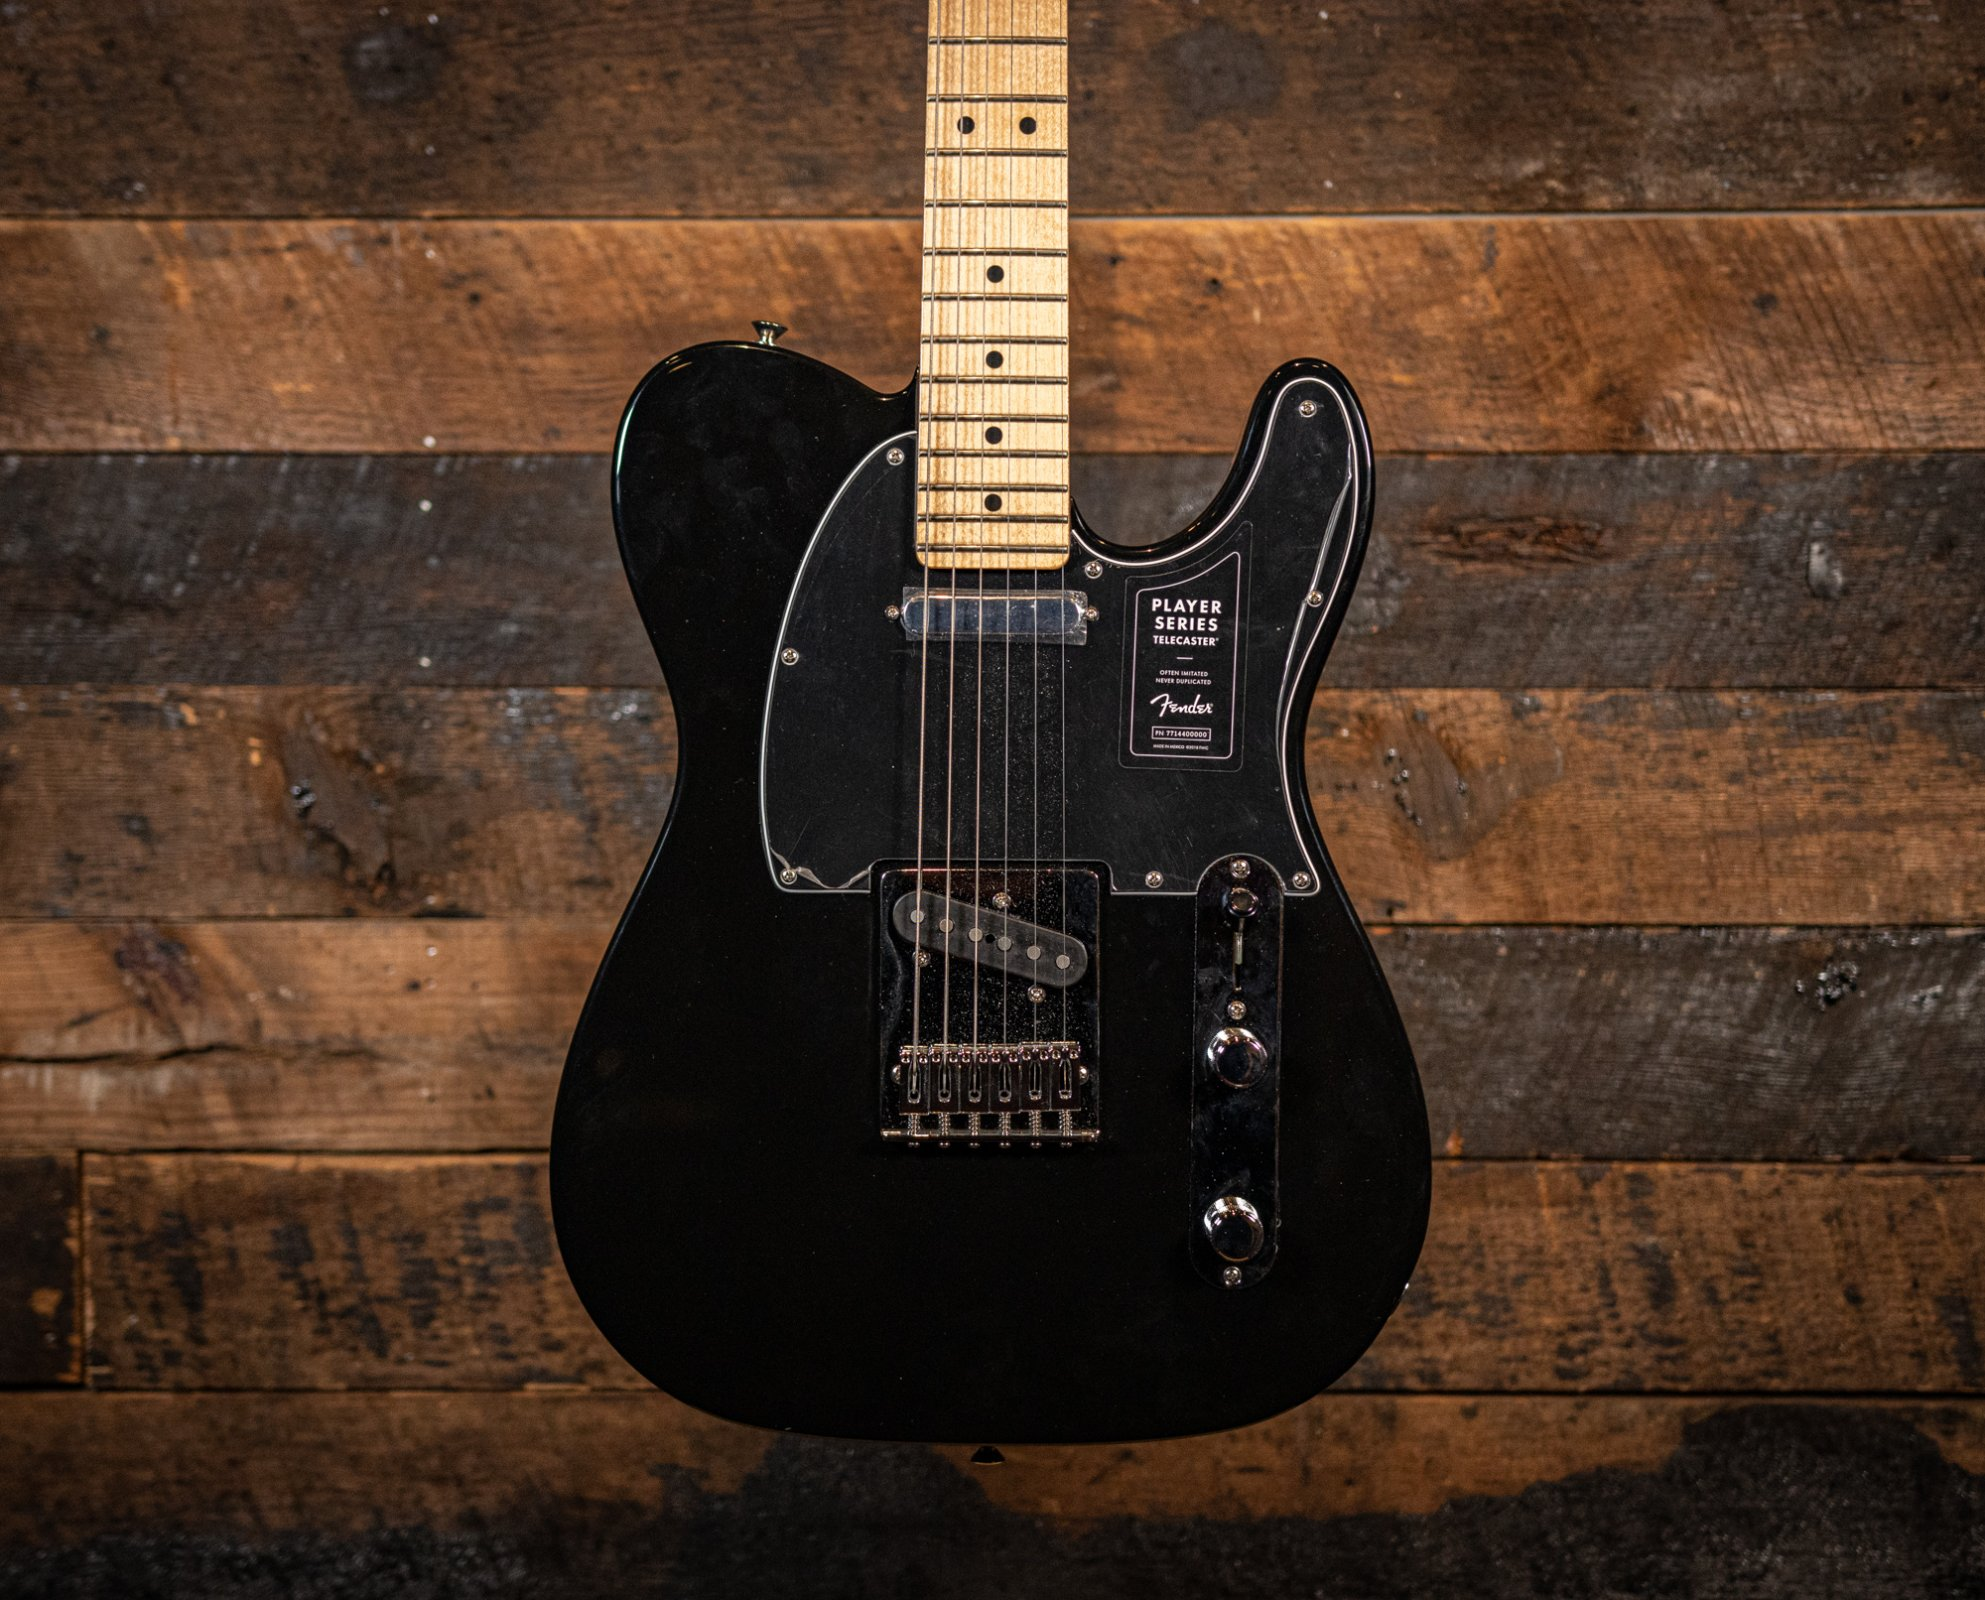 Fender Player series Telecaster Black